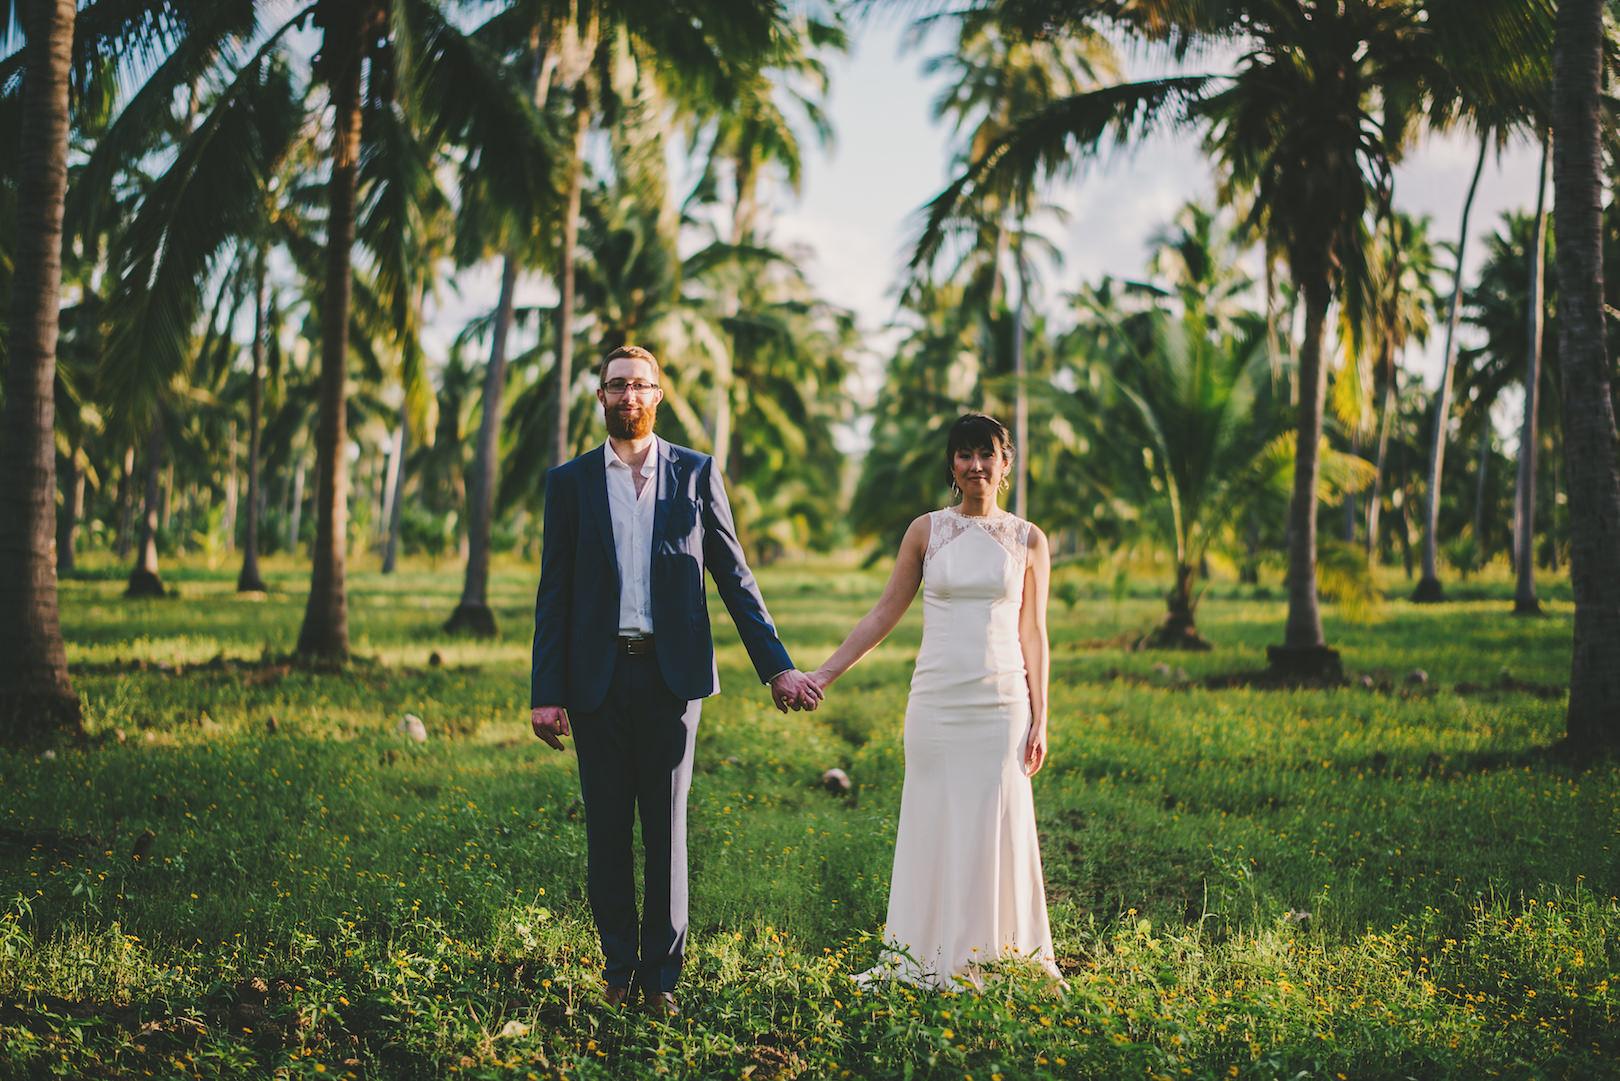 Nathan & Felicia - Wedding Day - © Dallas Kolotylo Photography - 491